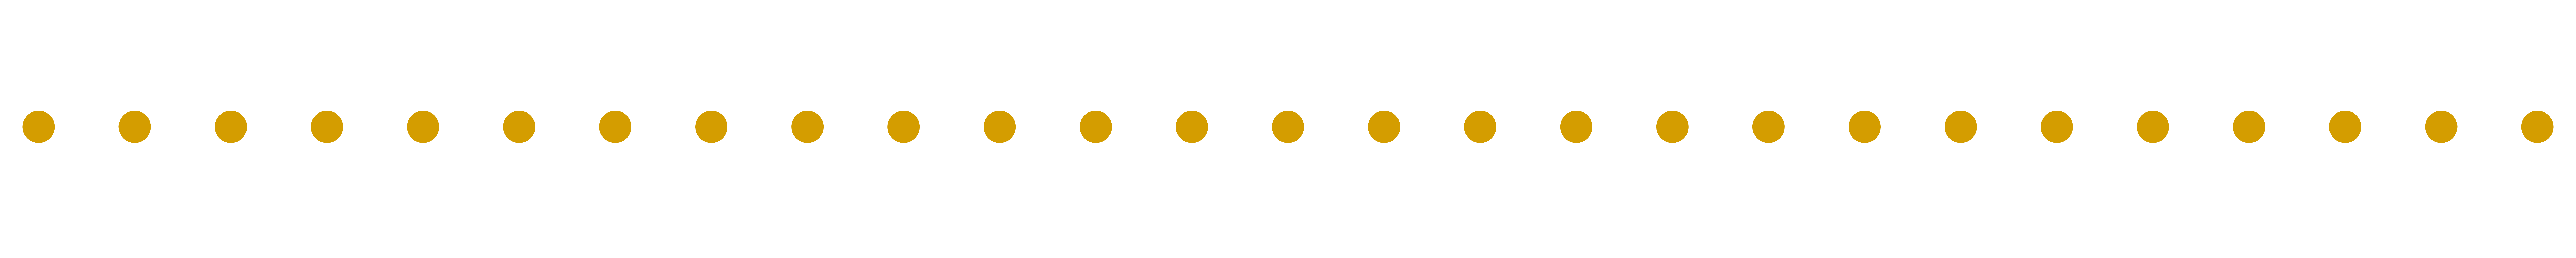 Horizontal dotted line_mango